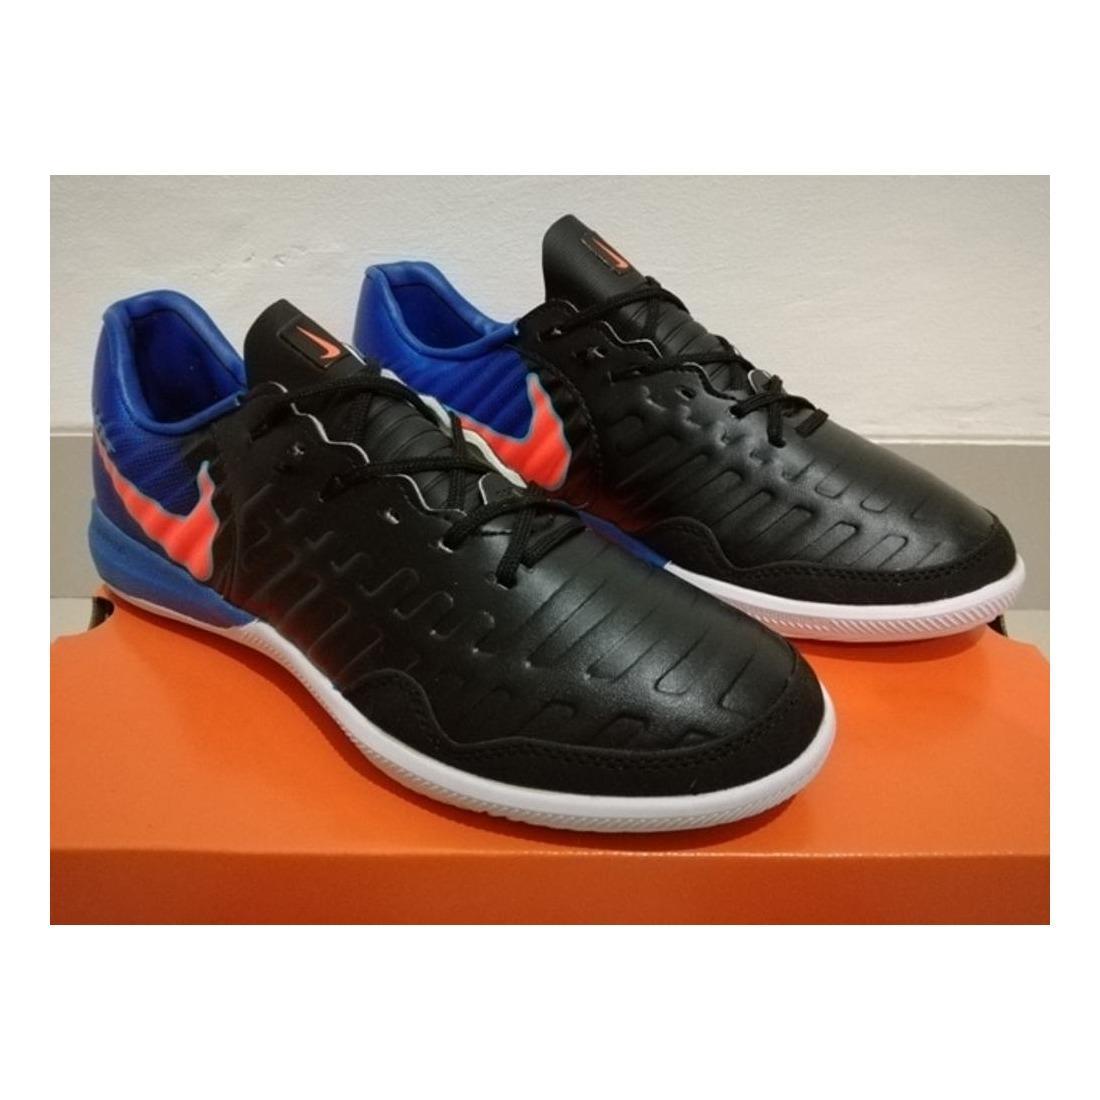 Sepatu Futsal Nike Tiempo Ligera IV Premium 5 Variasi Warna Hitam